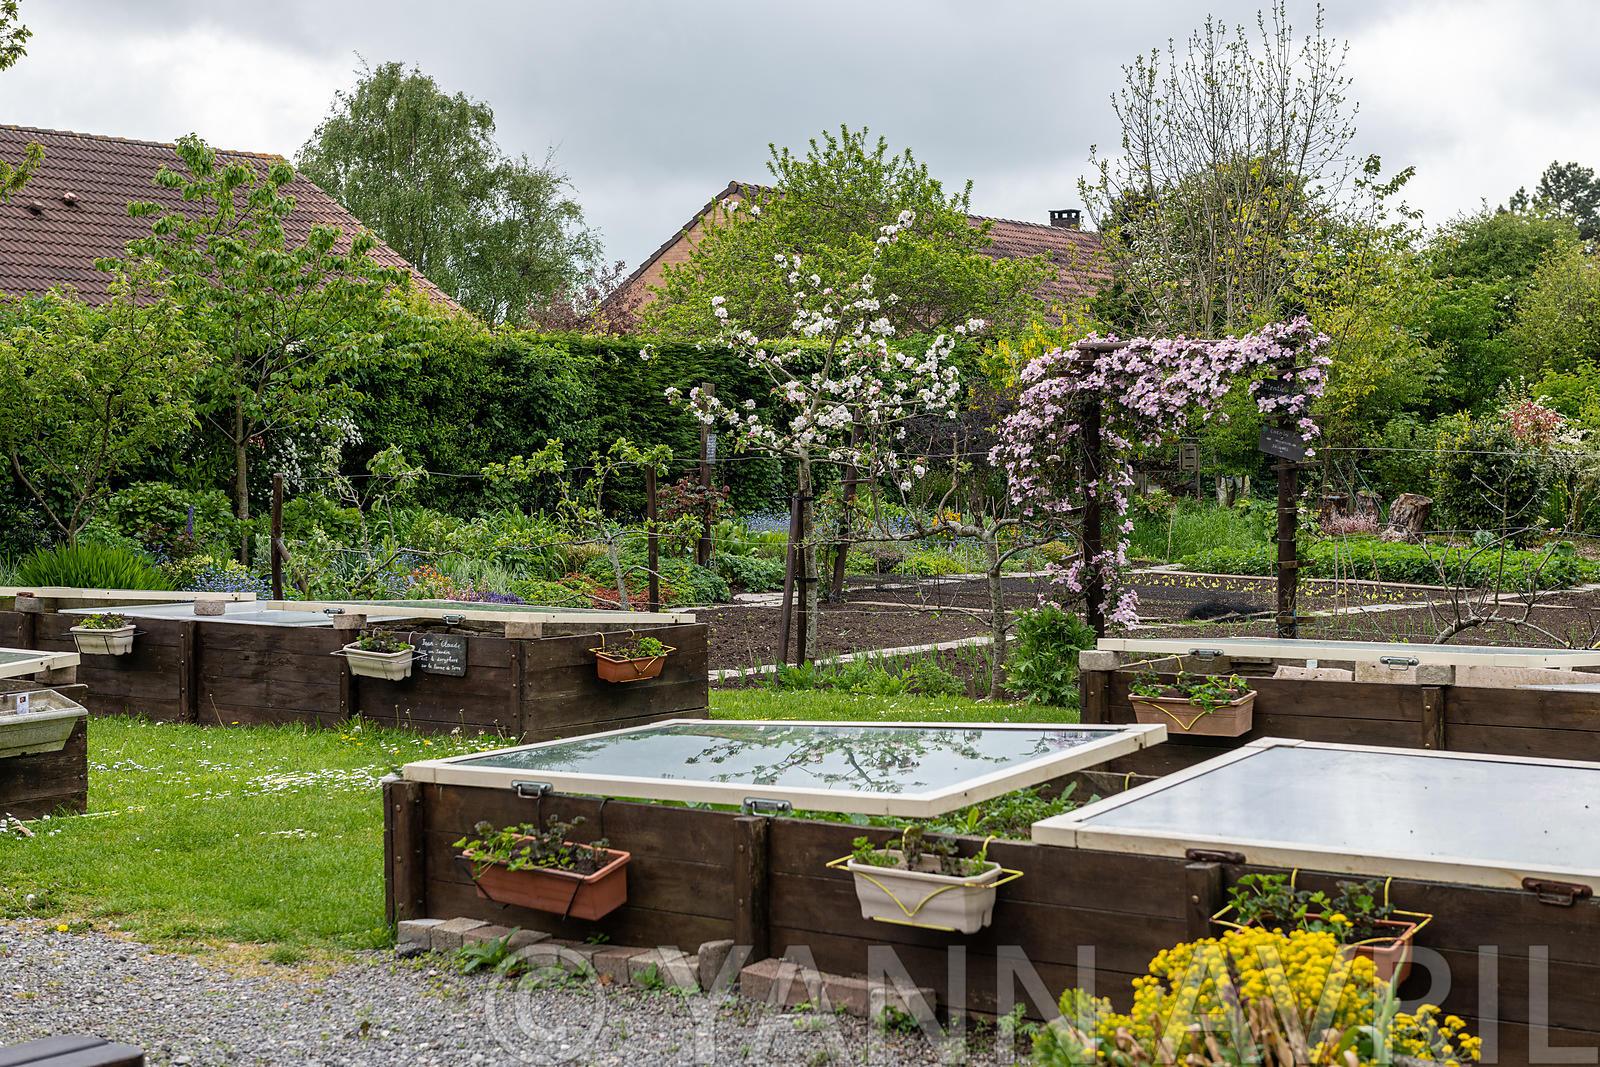 Yann Avril Photography | Garden And Nature Vegetables Under ... avec Chassis De Jardin